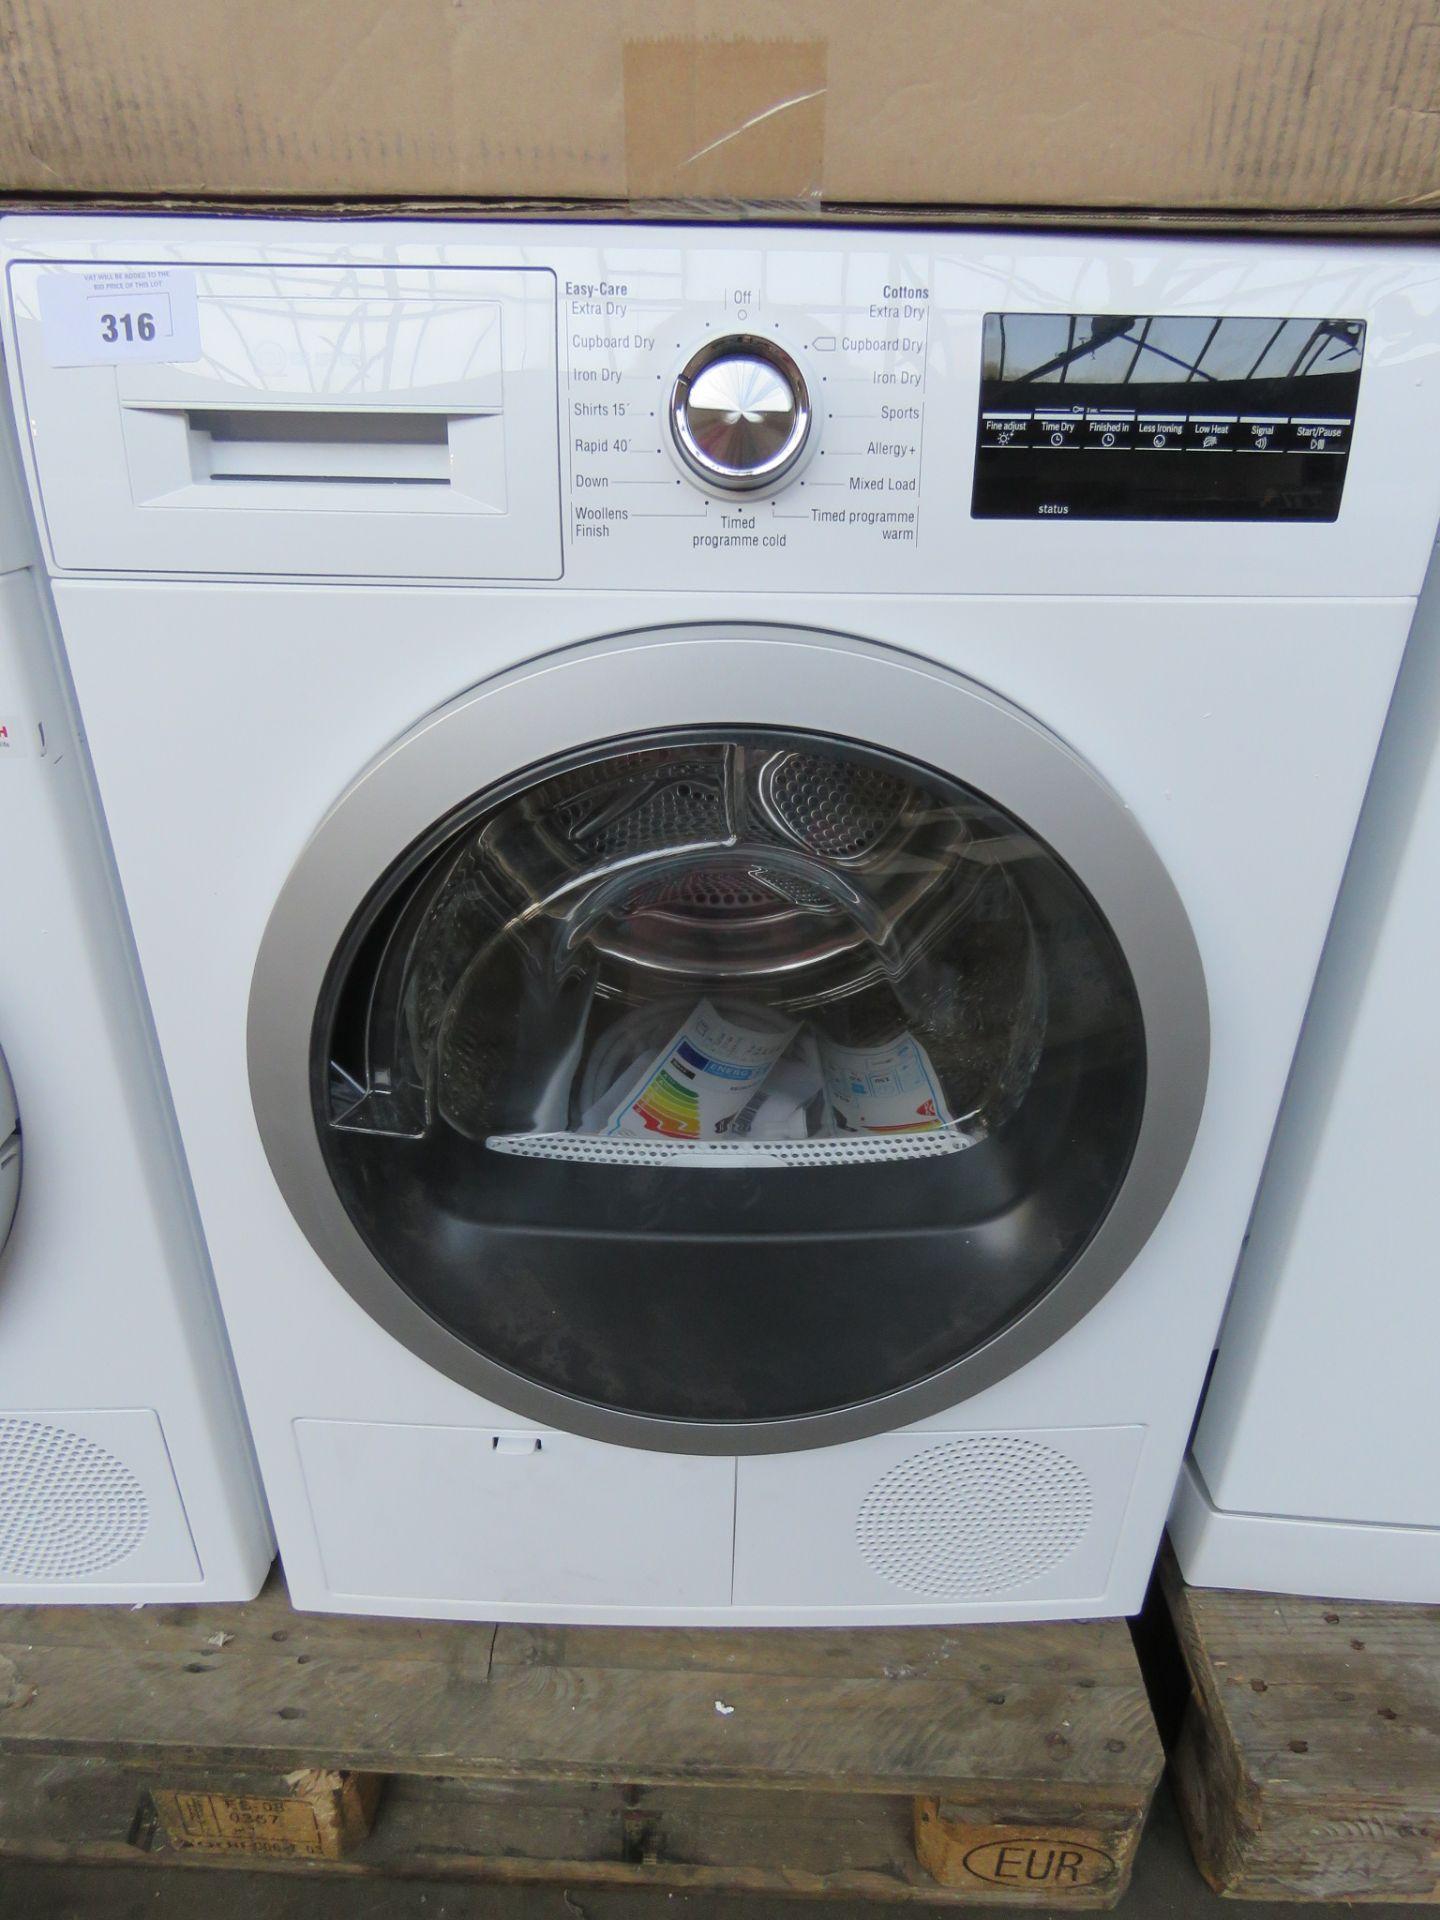 R8580X3GB-B Neff Tumble dryer